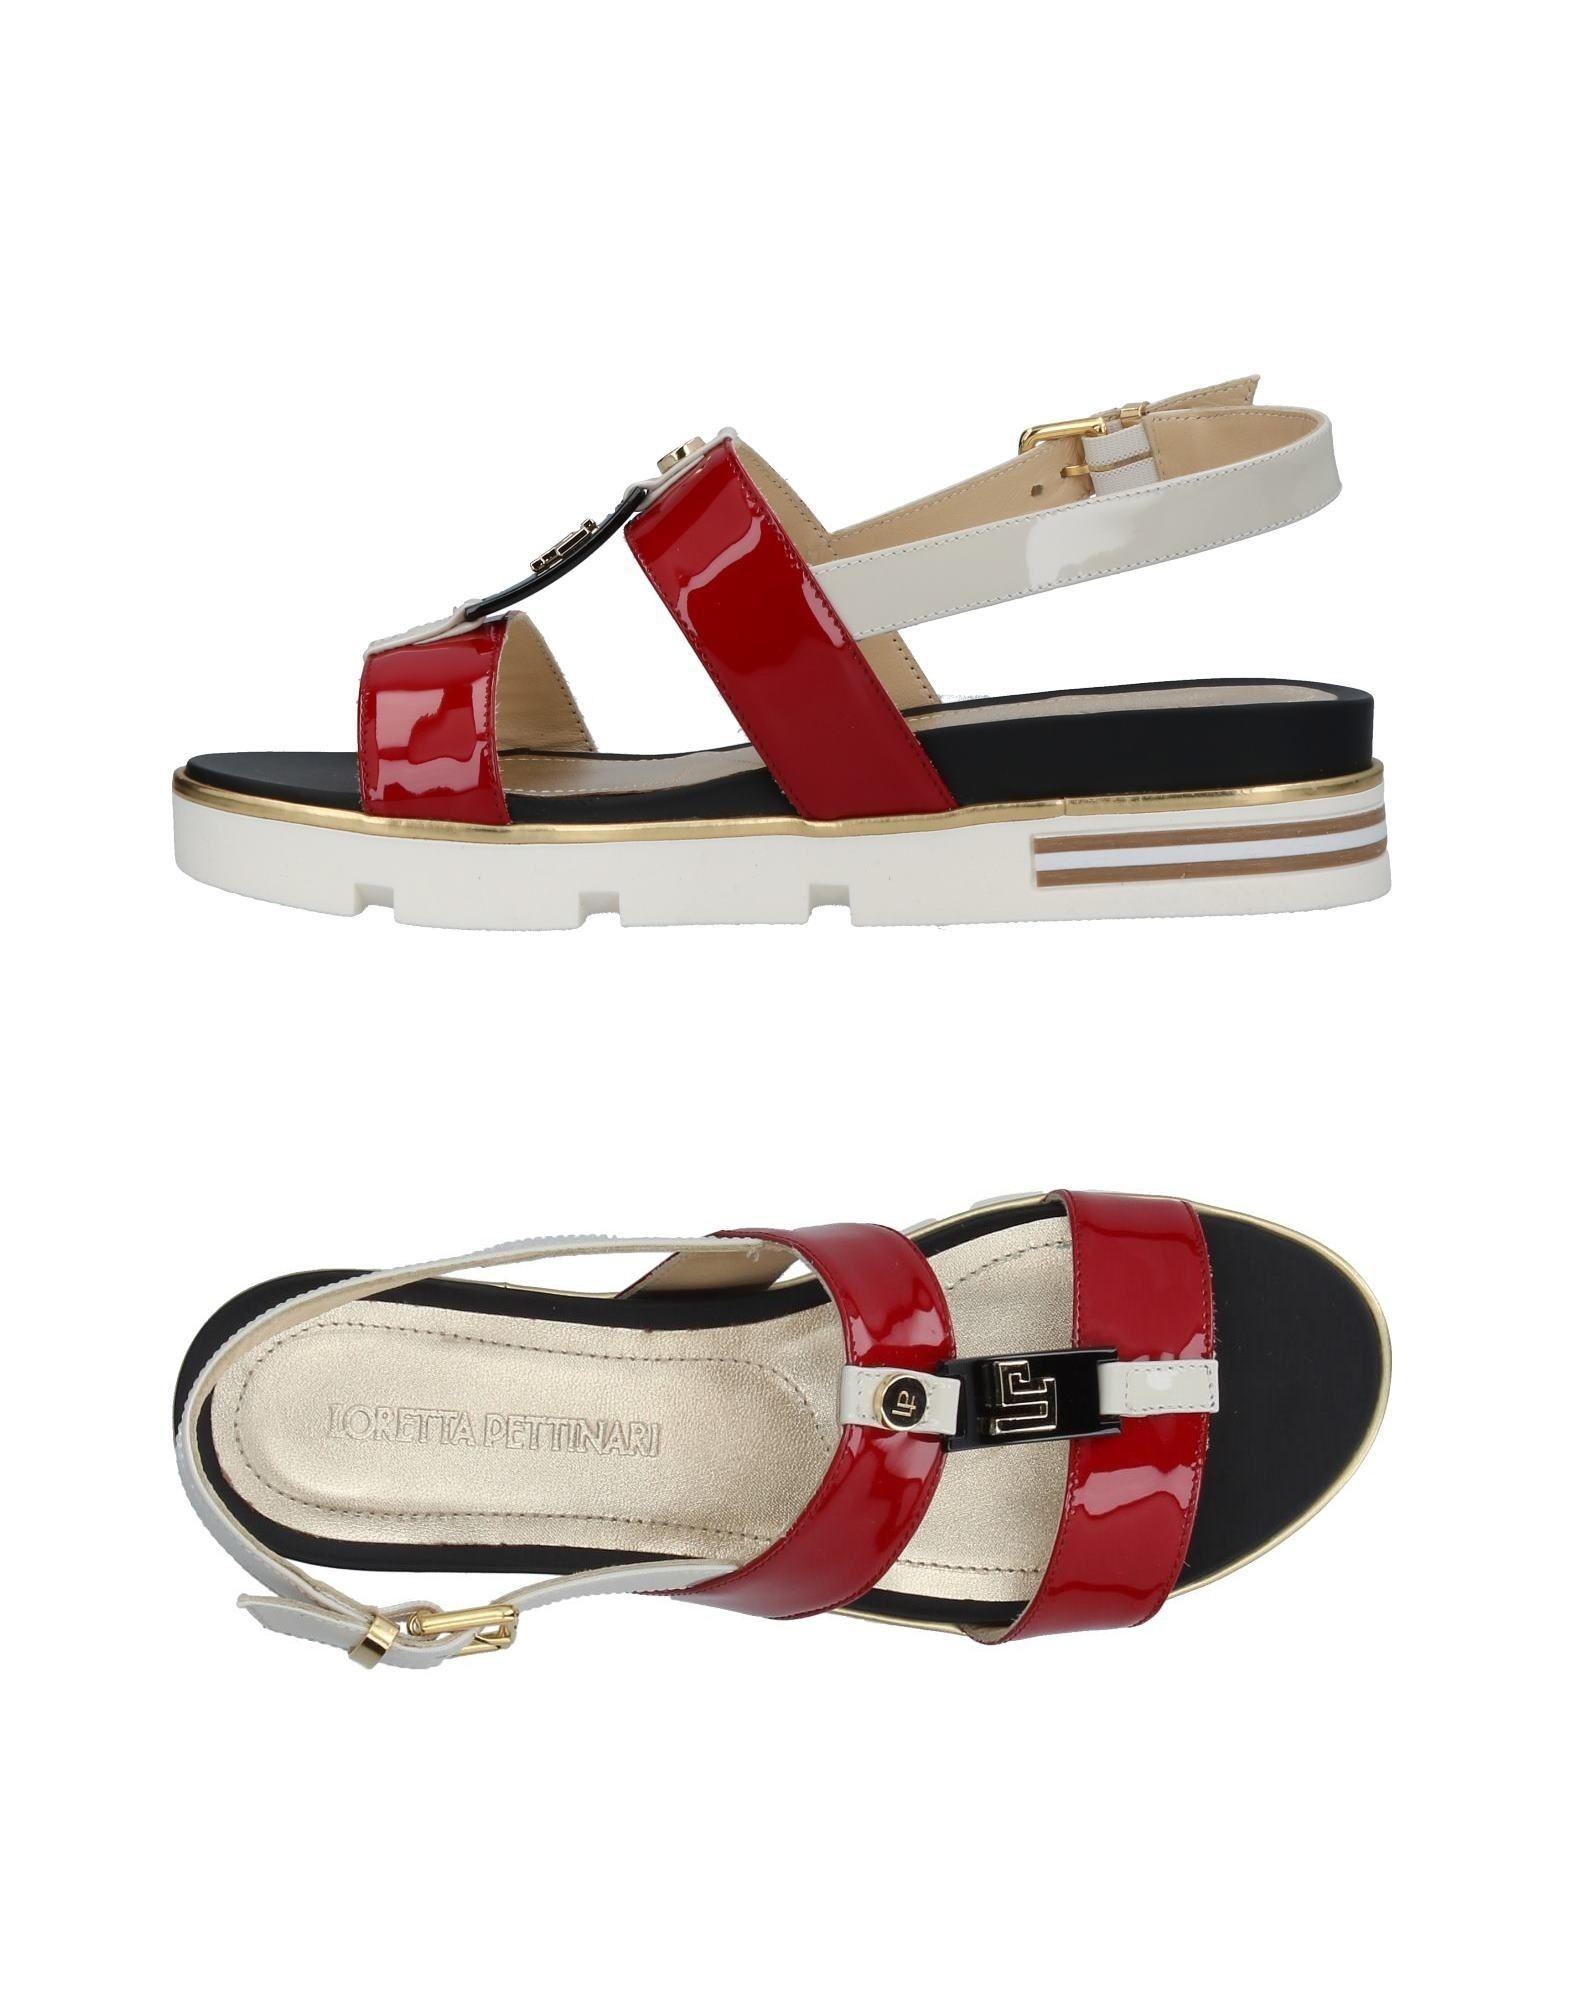 Loretta Pettinari Sandalen Damen  11389913GA Gute Qualität beliebte Schuhe